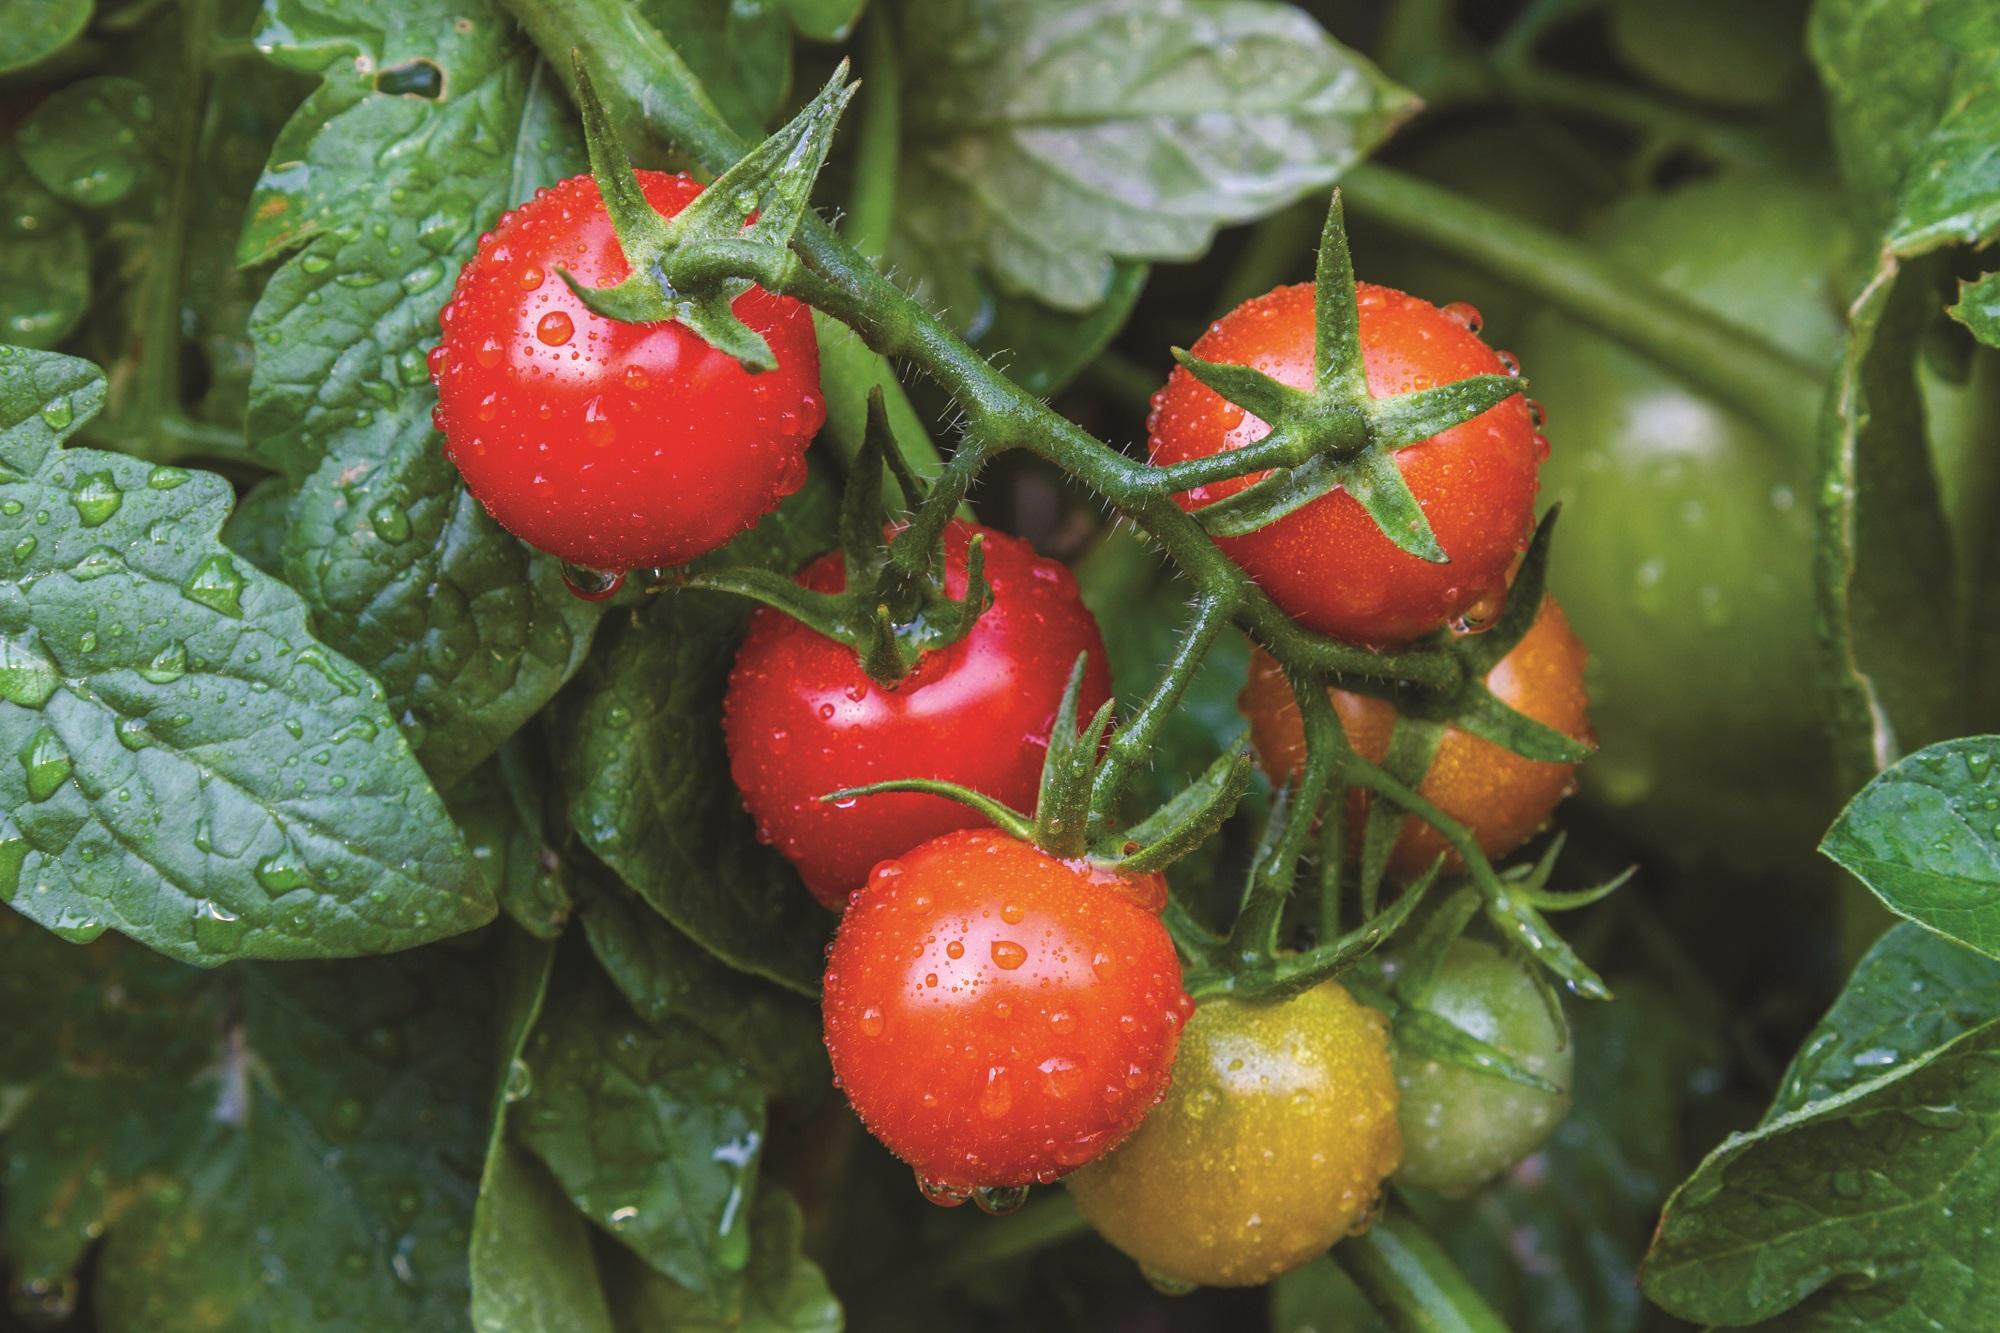 Tomate, post image